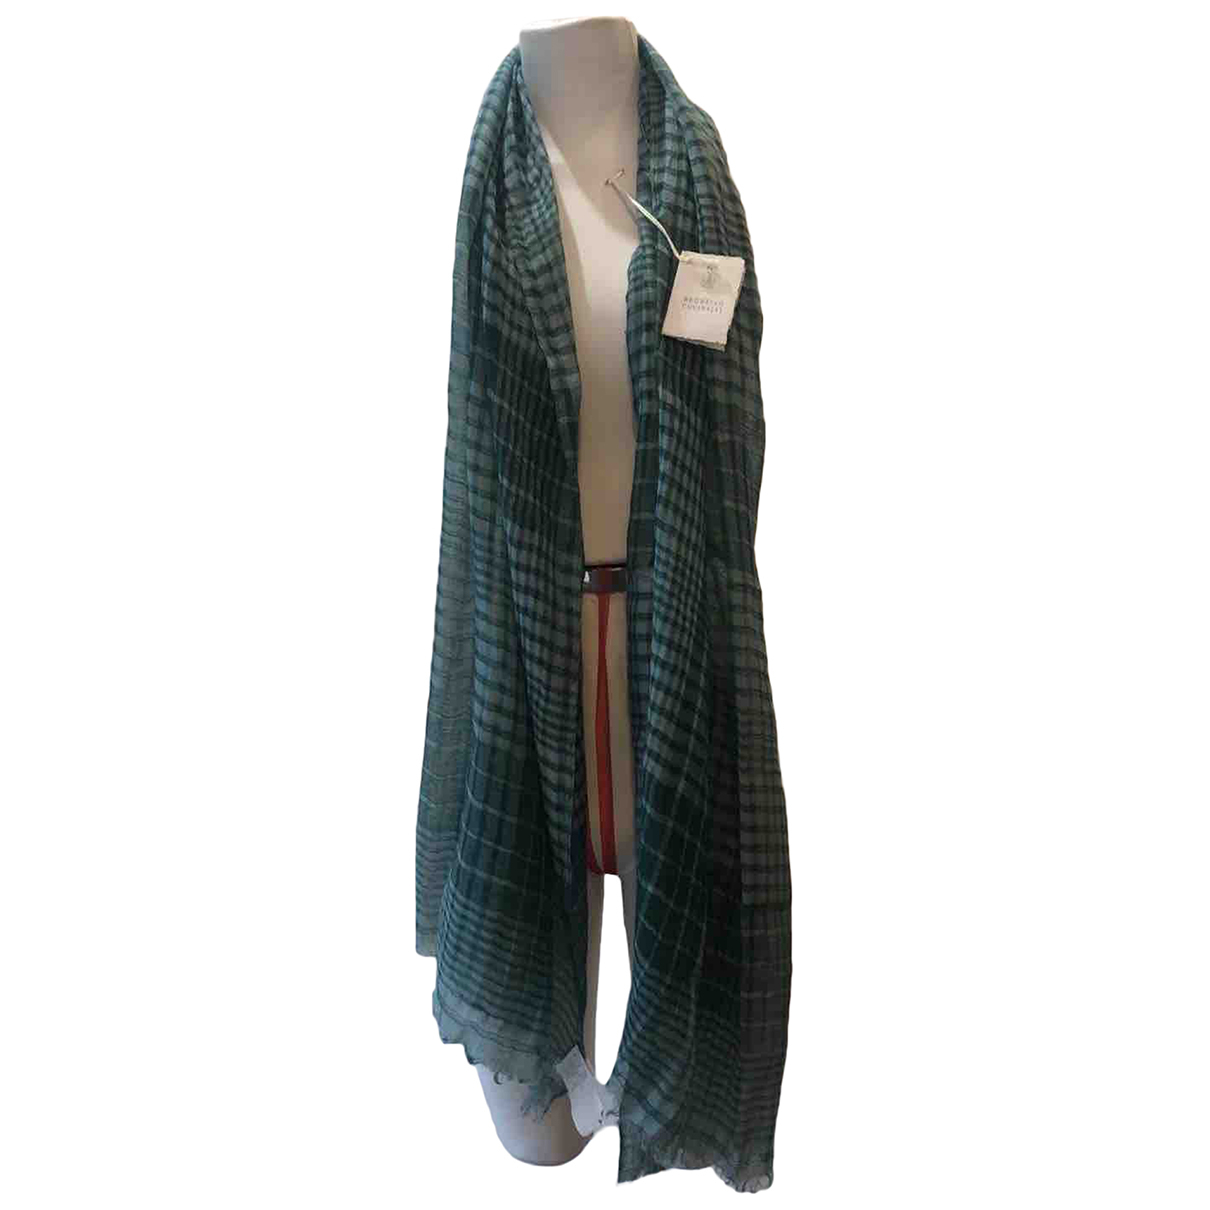 Brunello Cucinelli N Green Cashmere scarf & pocket squares for Men N